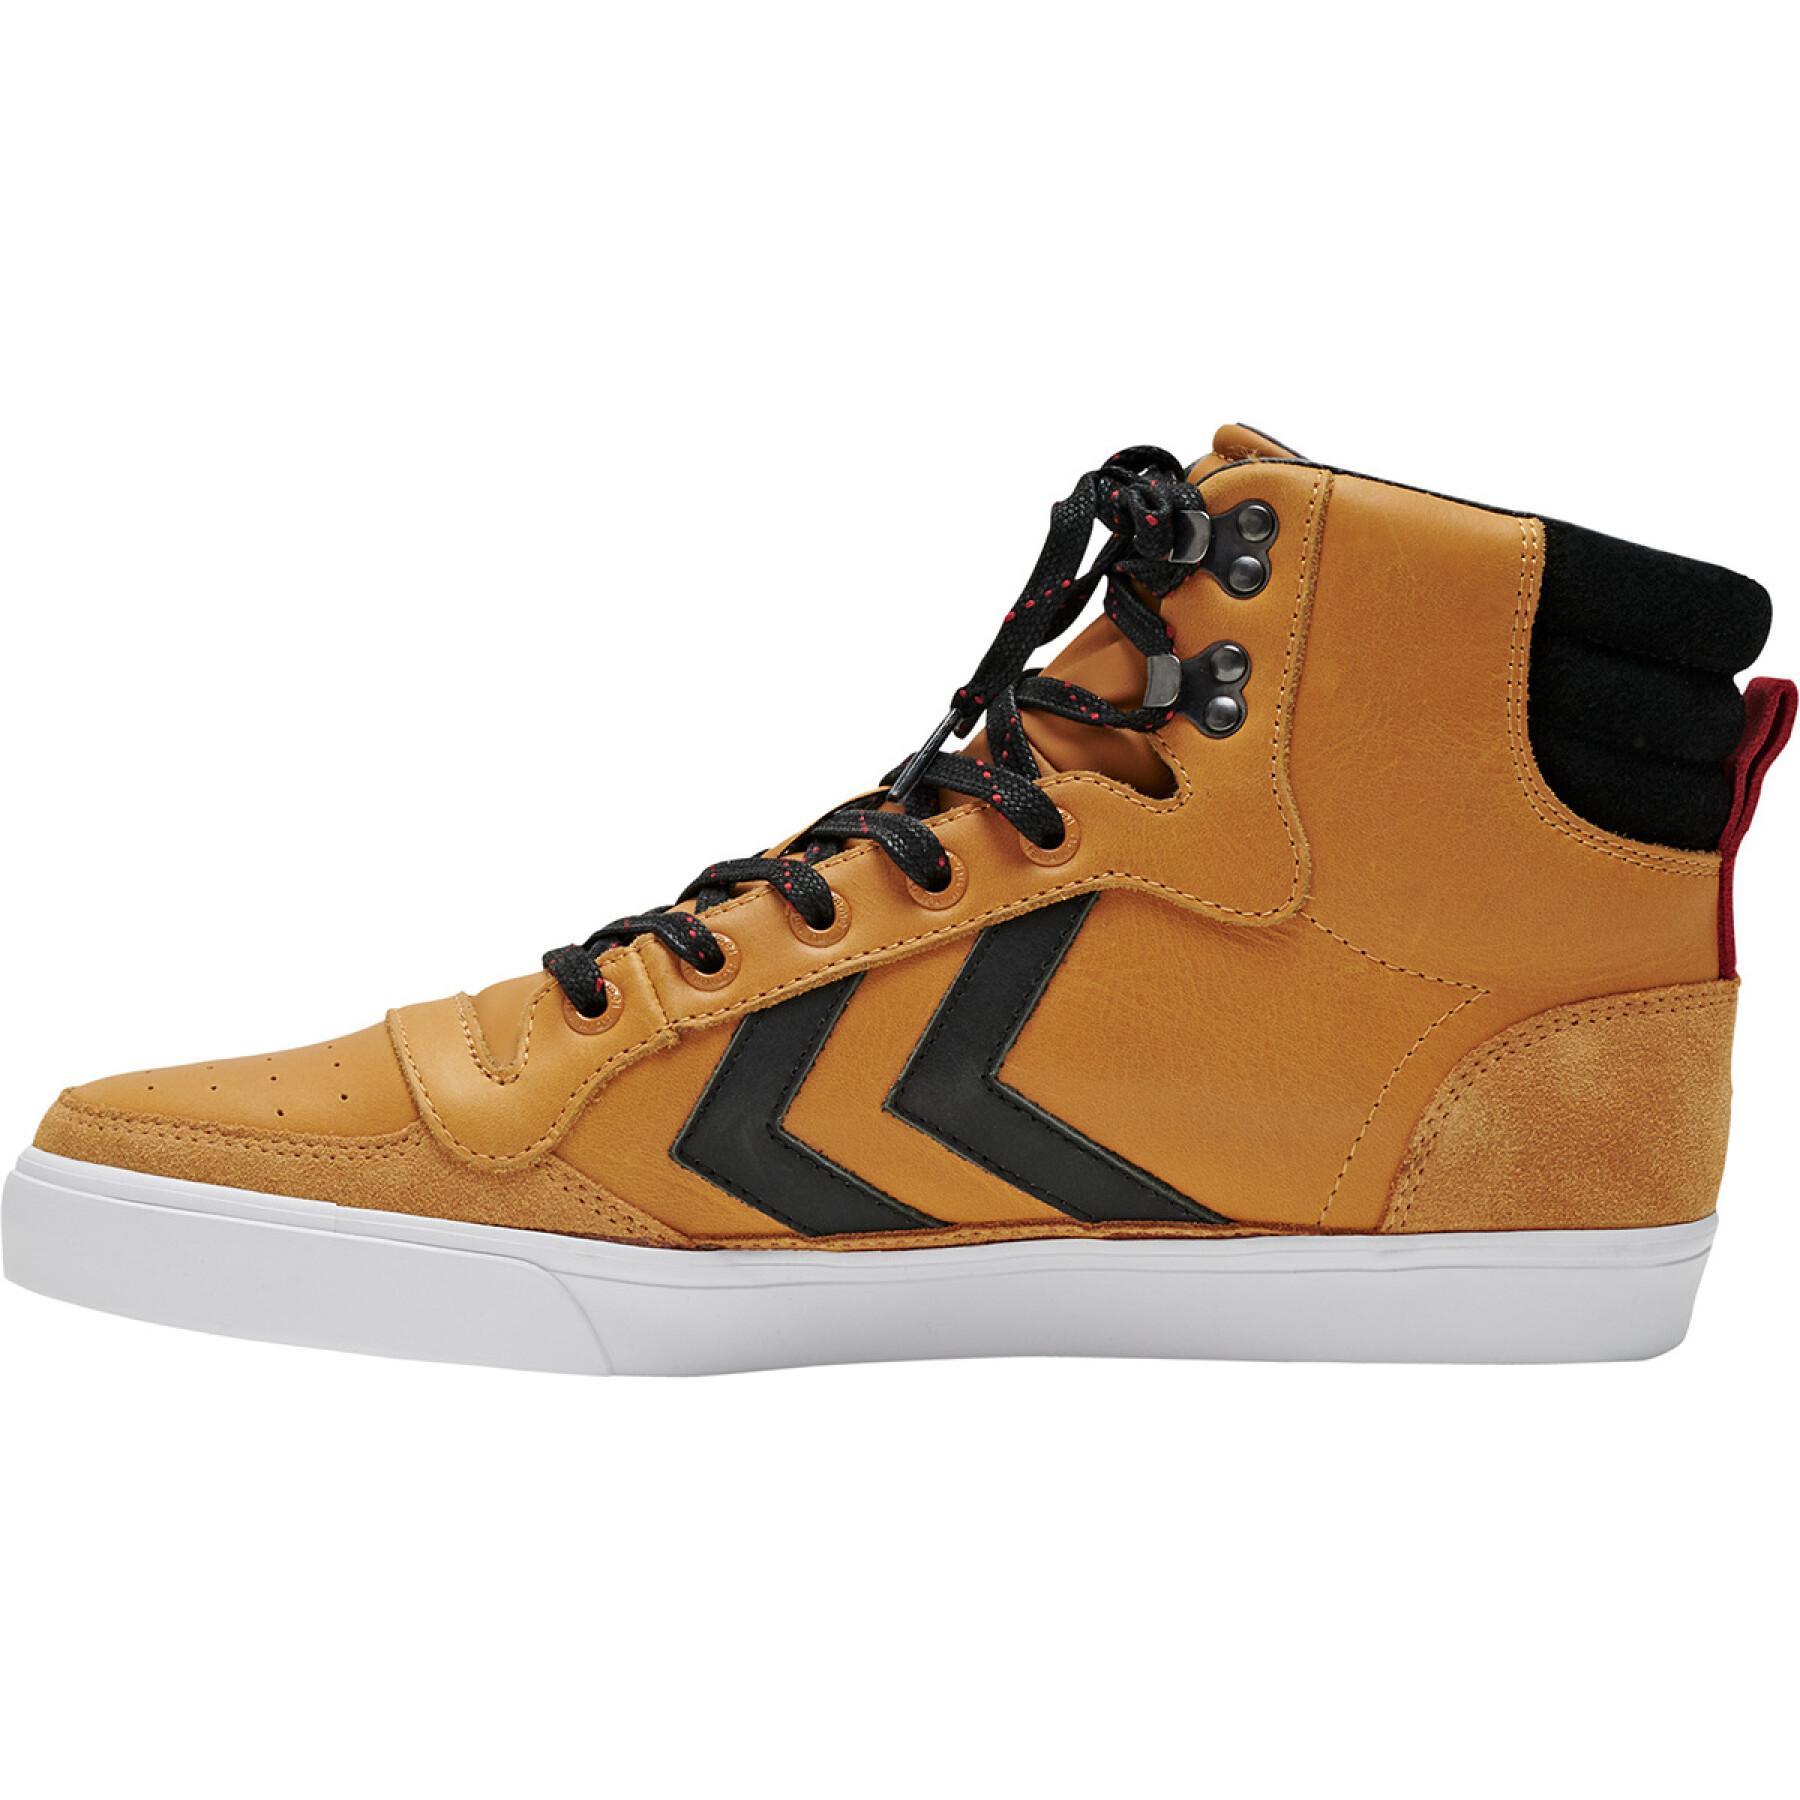 Chaussures Hummel Stadil Winter - Marron